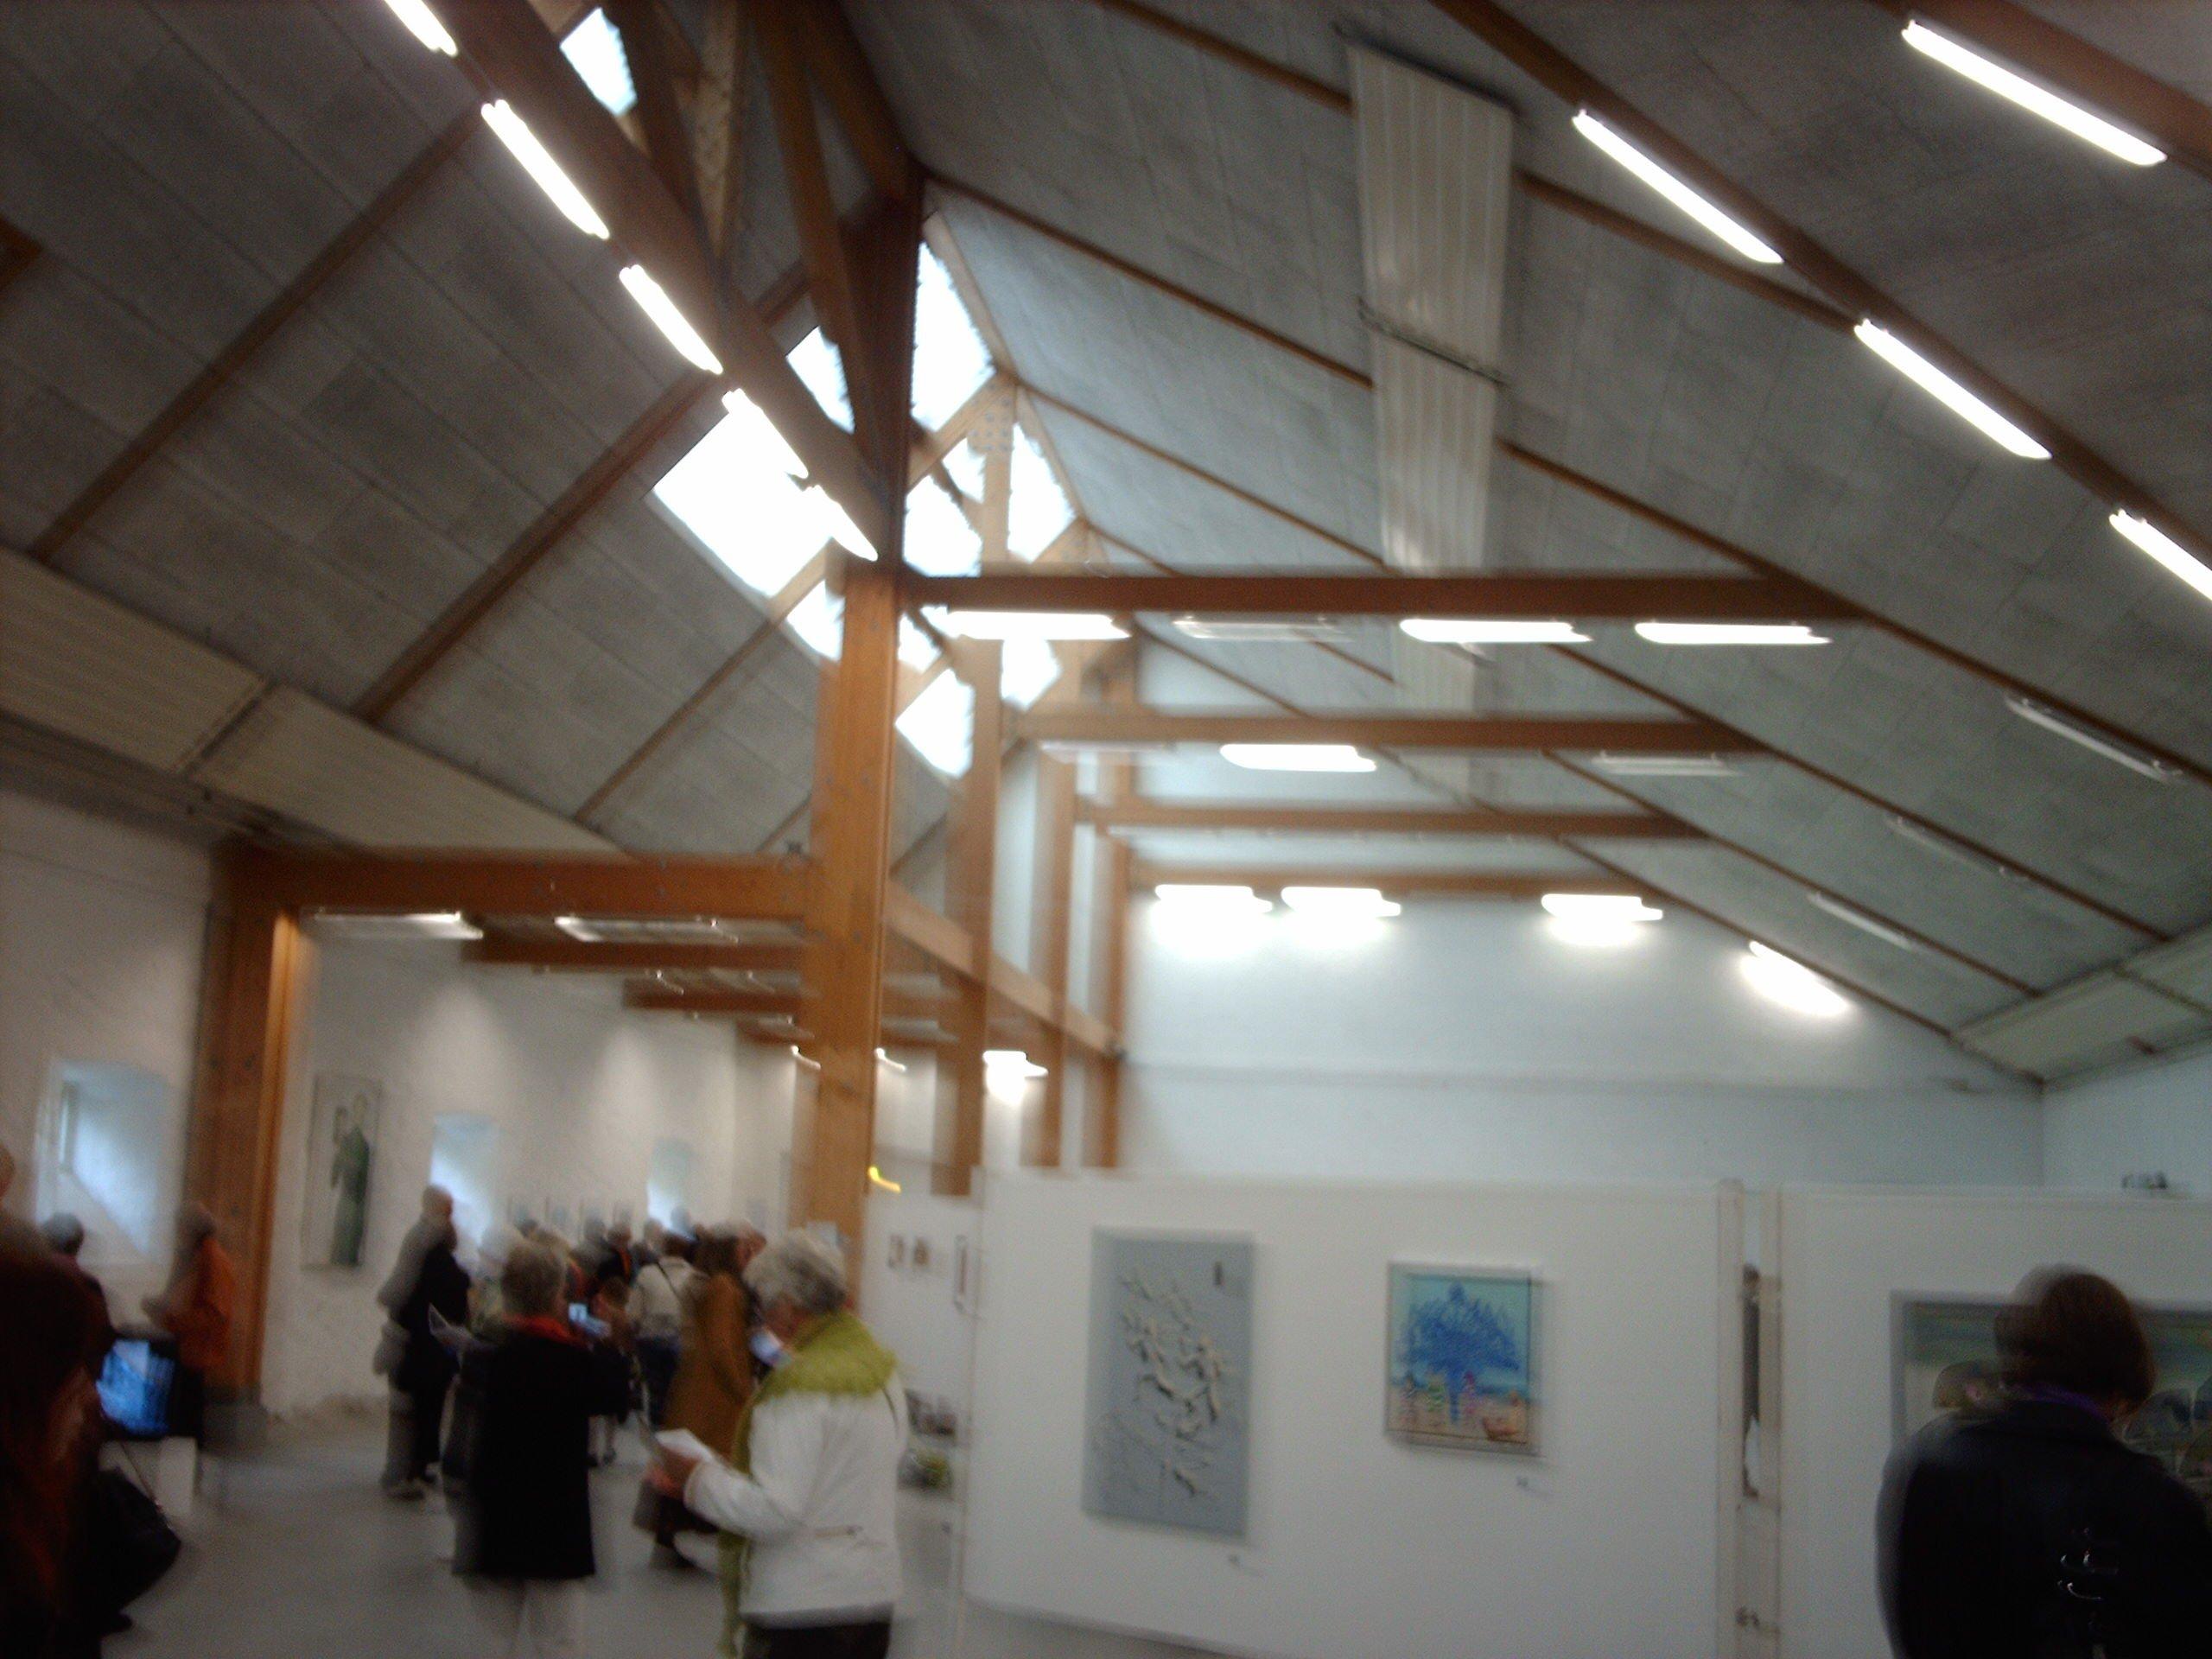 D Max Exhibition Hall : Exhibition hall